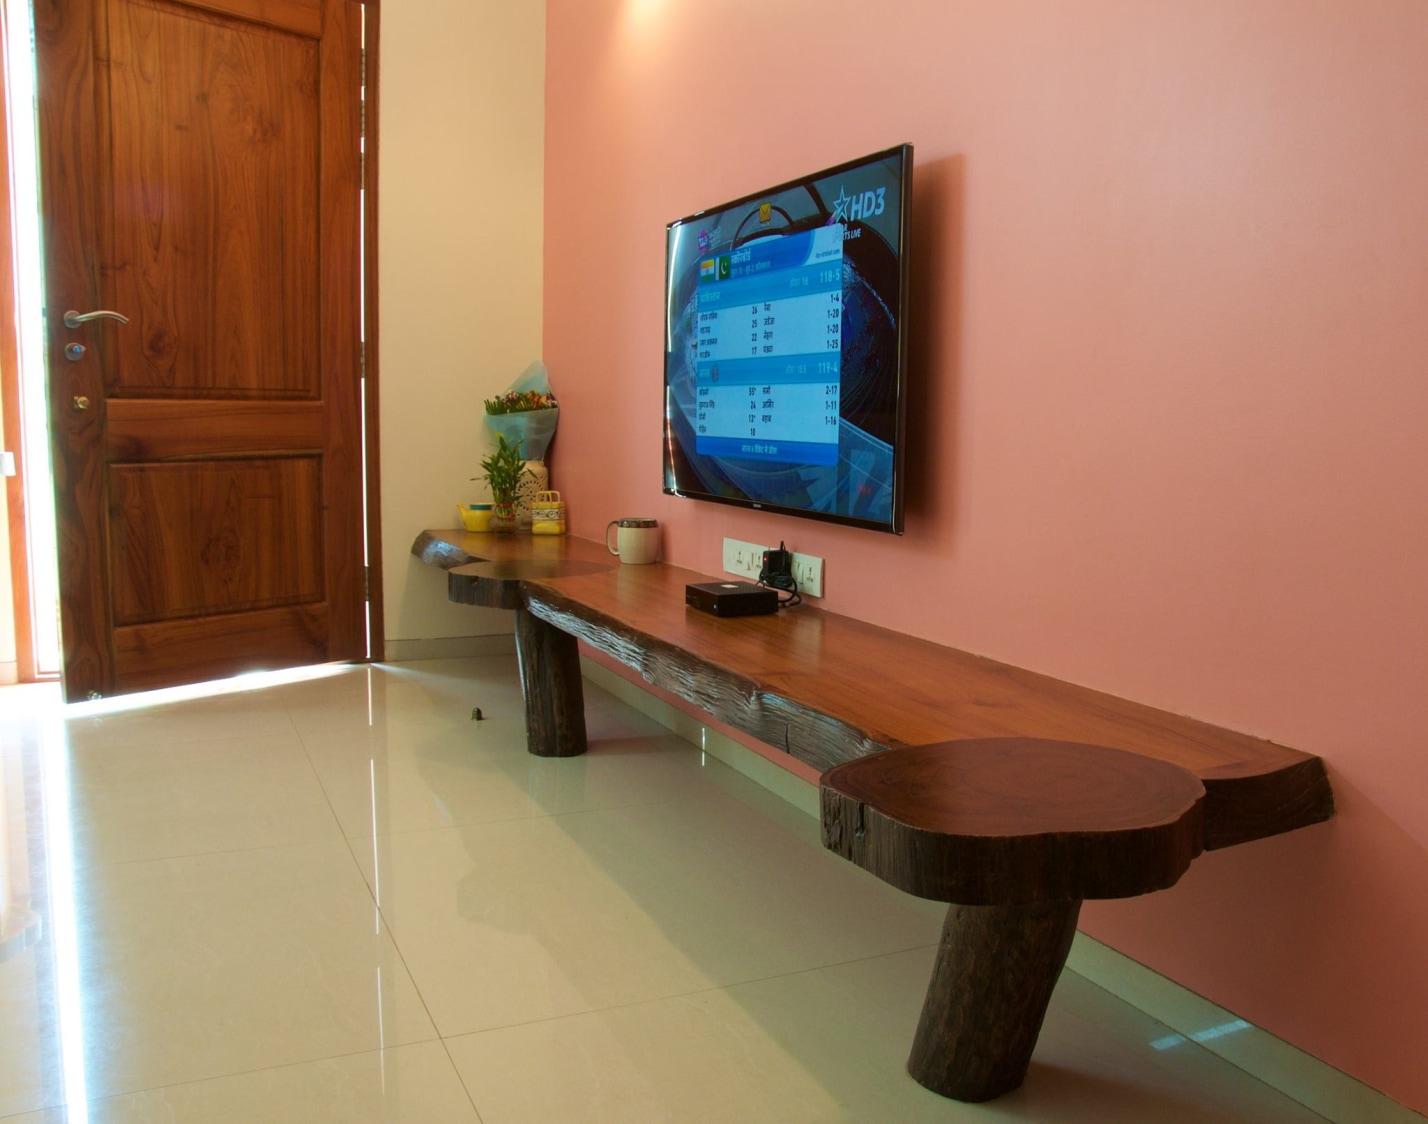 TV unit with Pink Wall and Wooden Display Unit by Viraf Laskari  Living-room Minimalistic | Interior Design Photos & Ideas